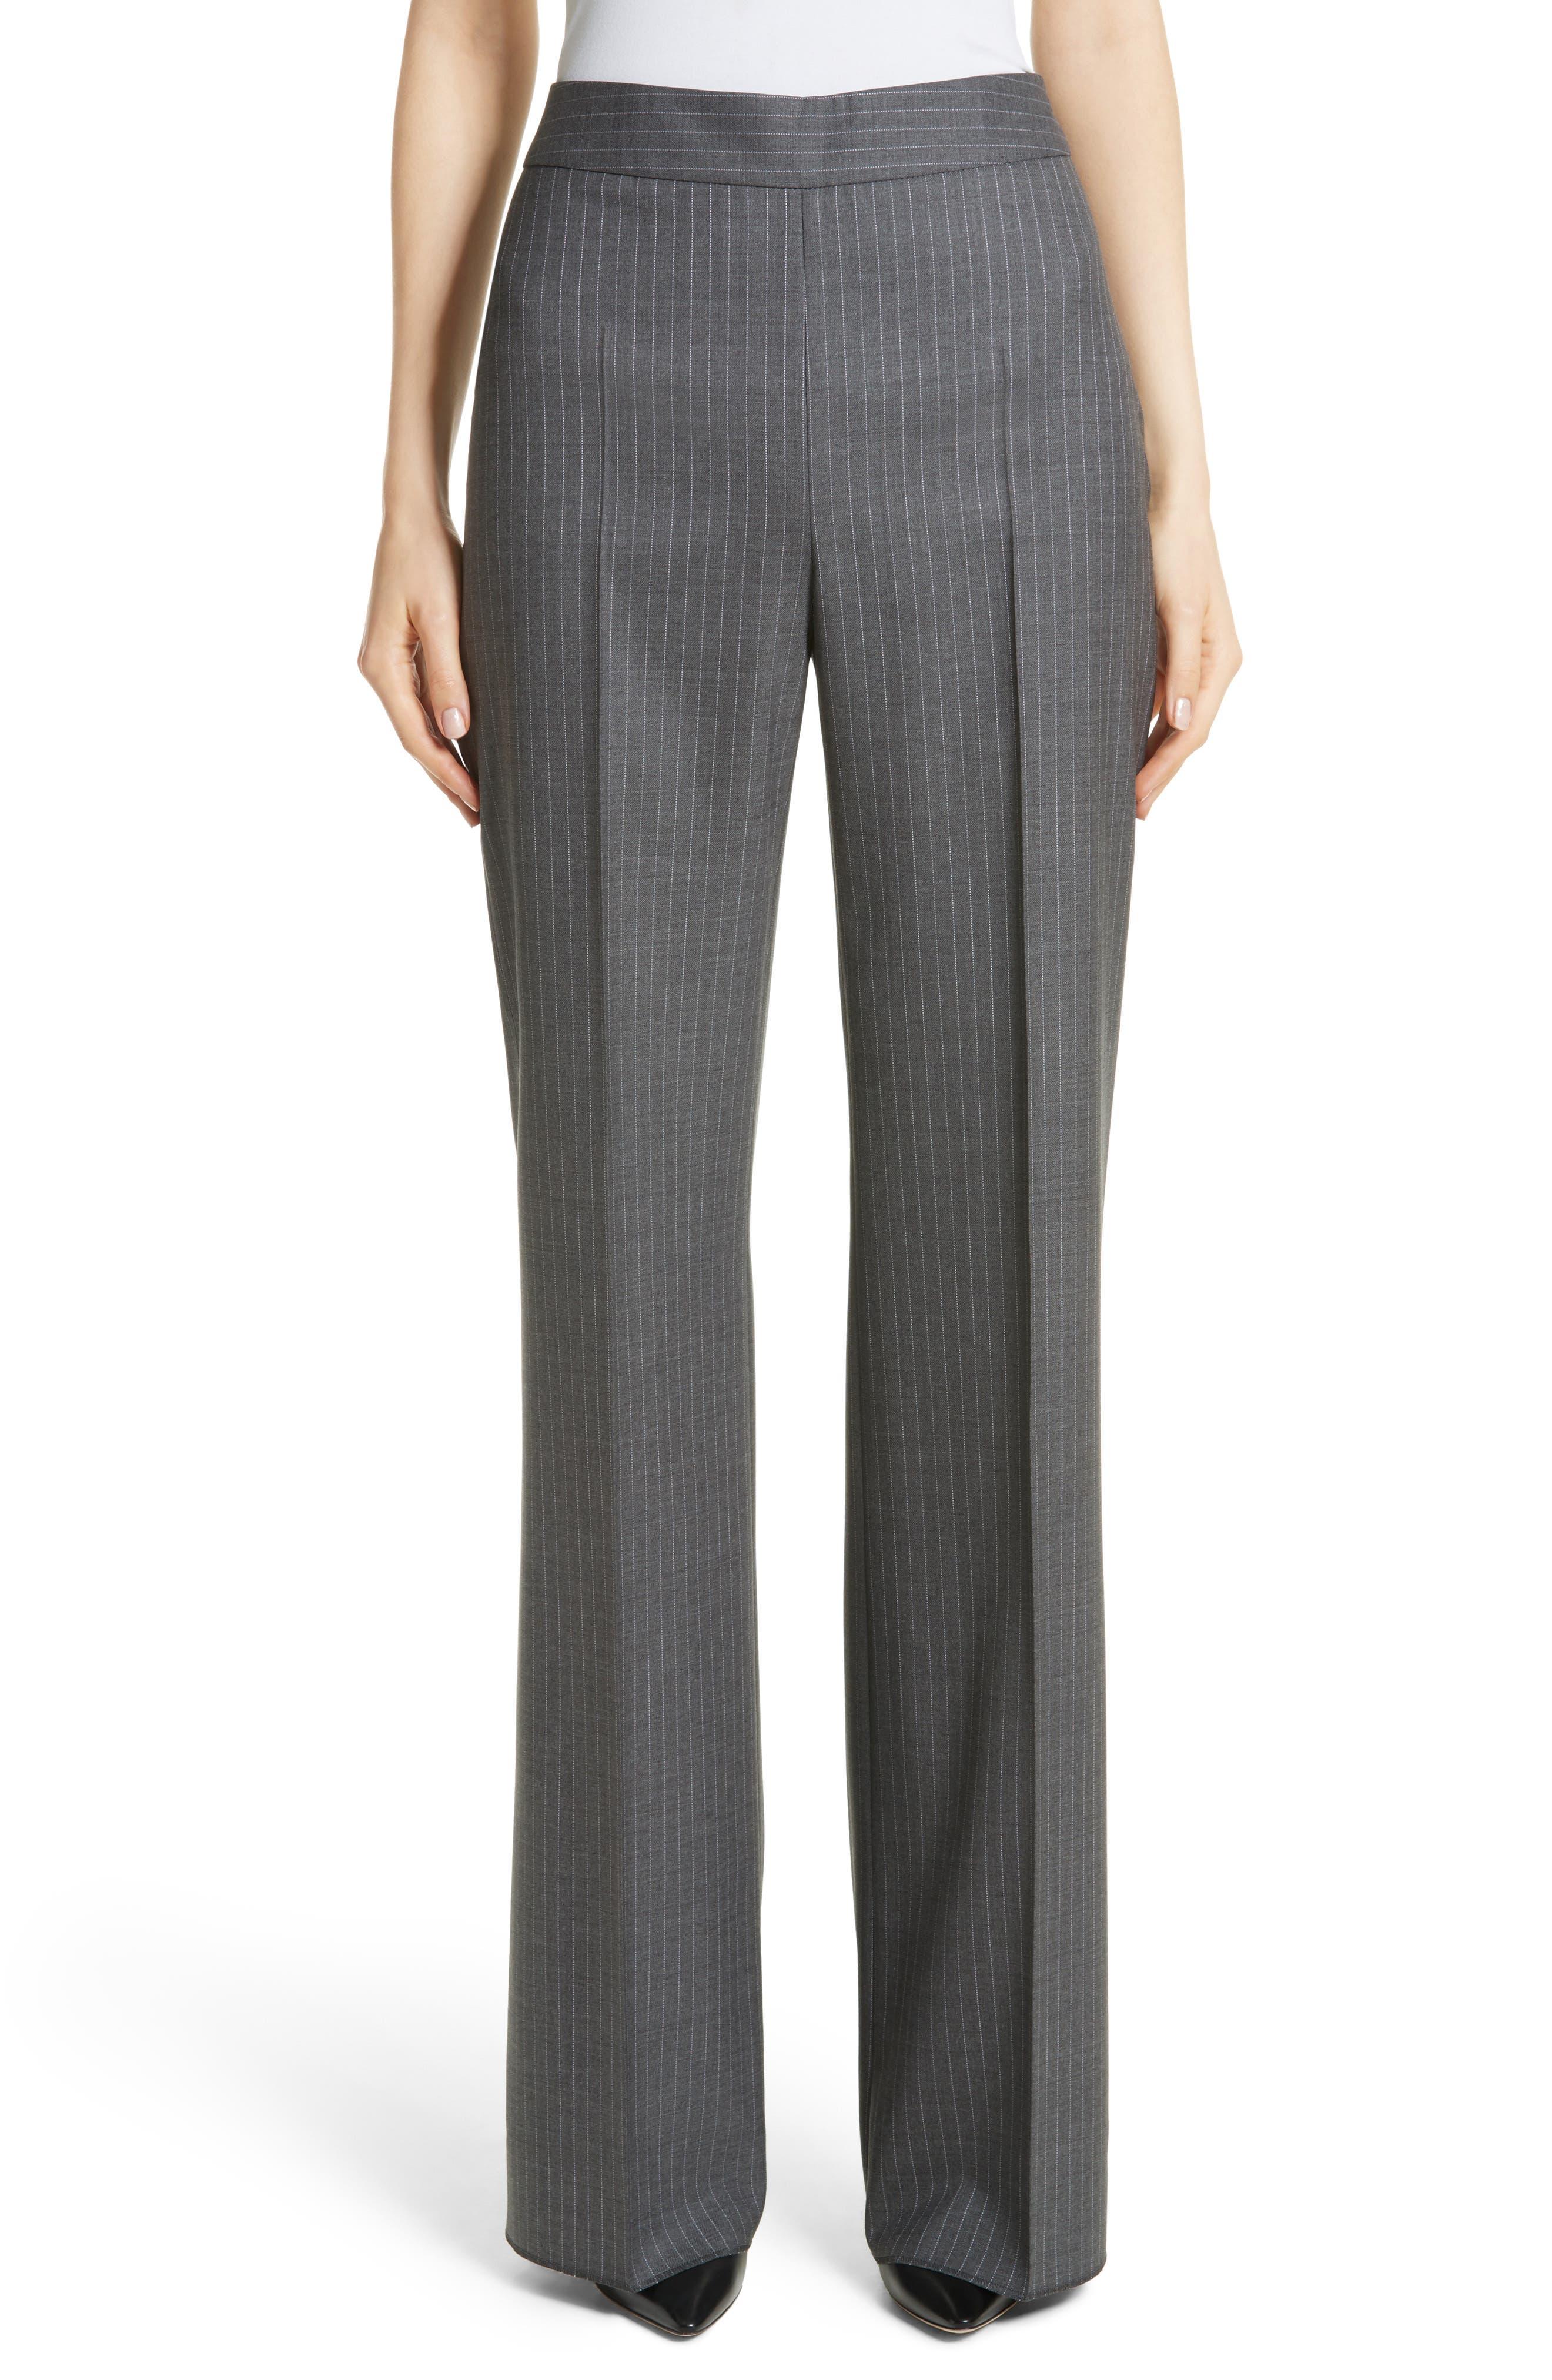 Garibo Stretch Wool Pinstripe Pants,                         Main,                         color, 034